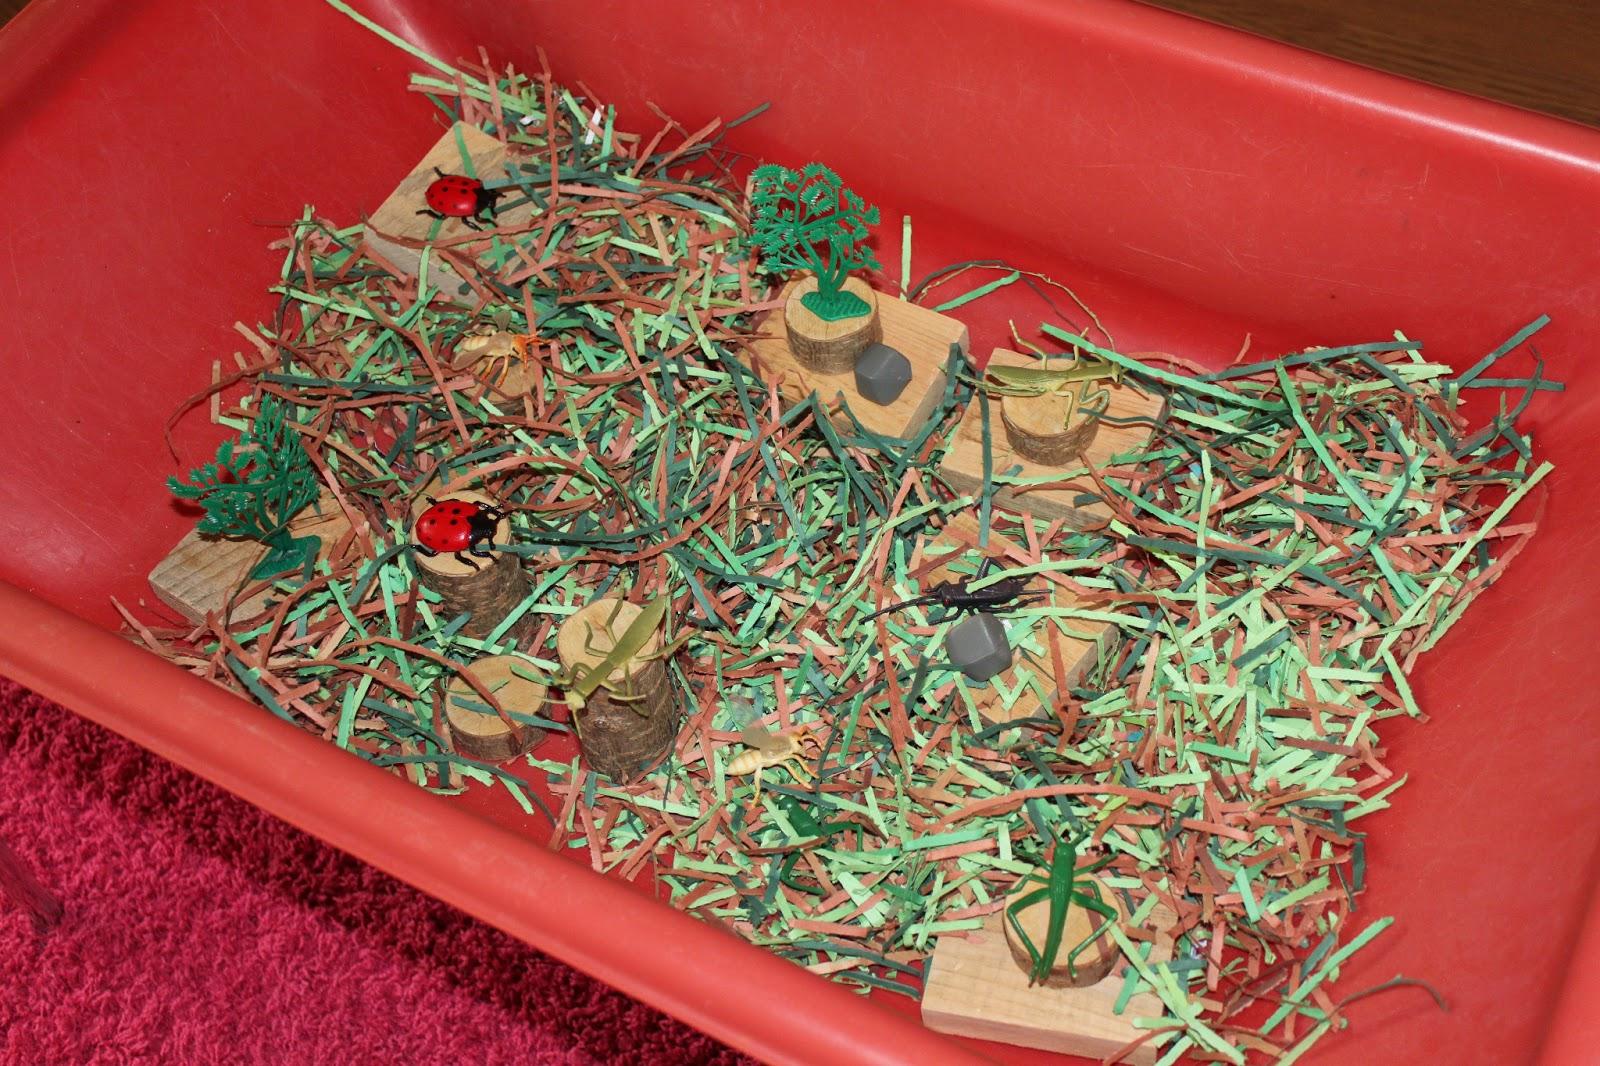 Bug theme shredded paper wood blocks plastic bugs and trees